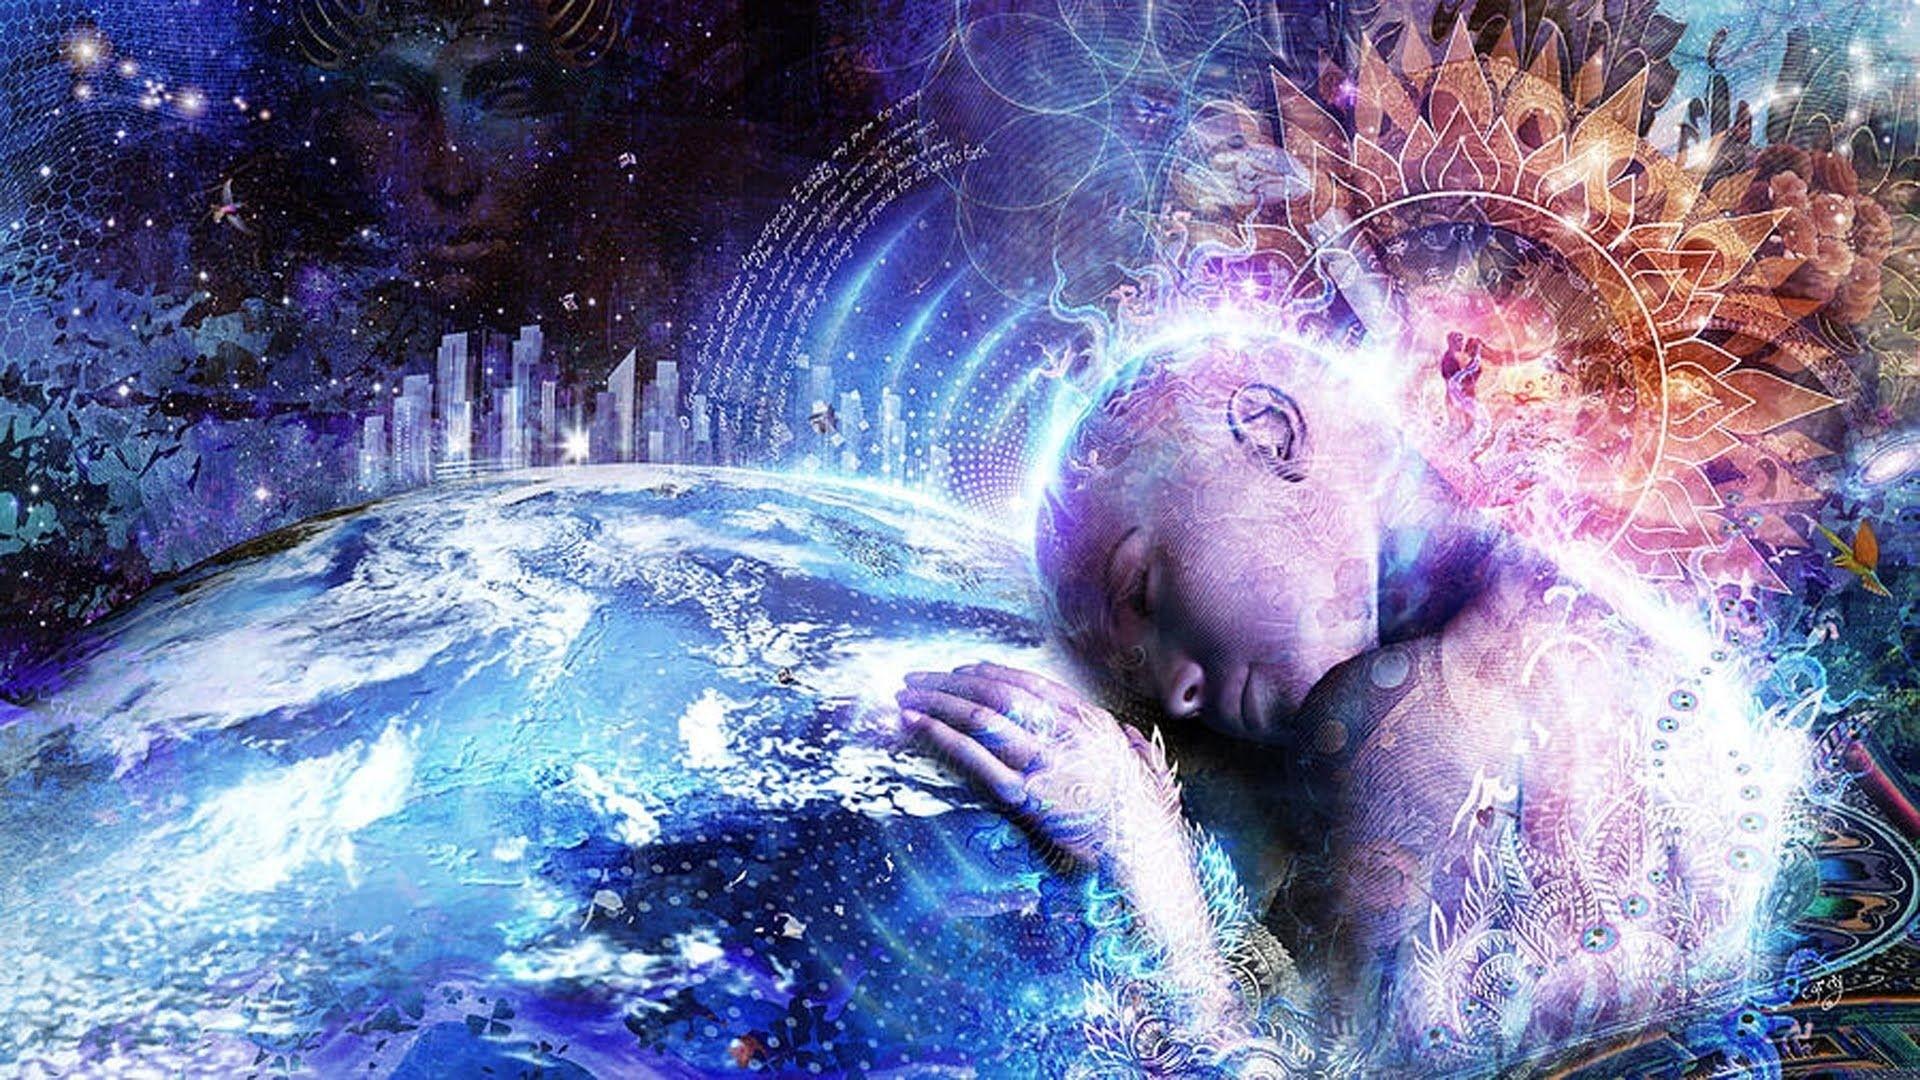 Spiritual hd desktop wallpaper